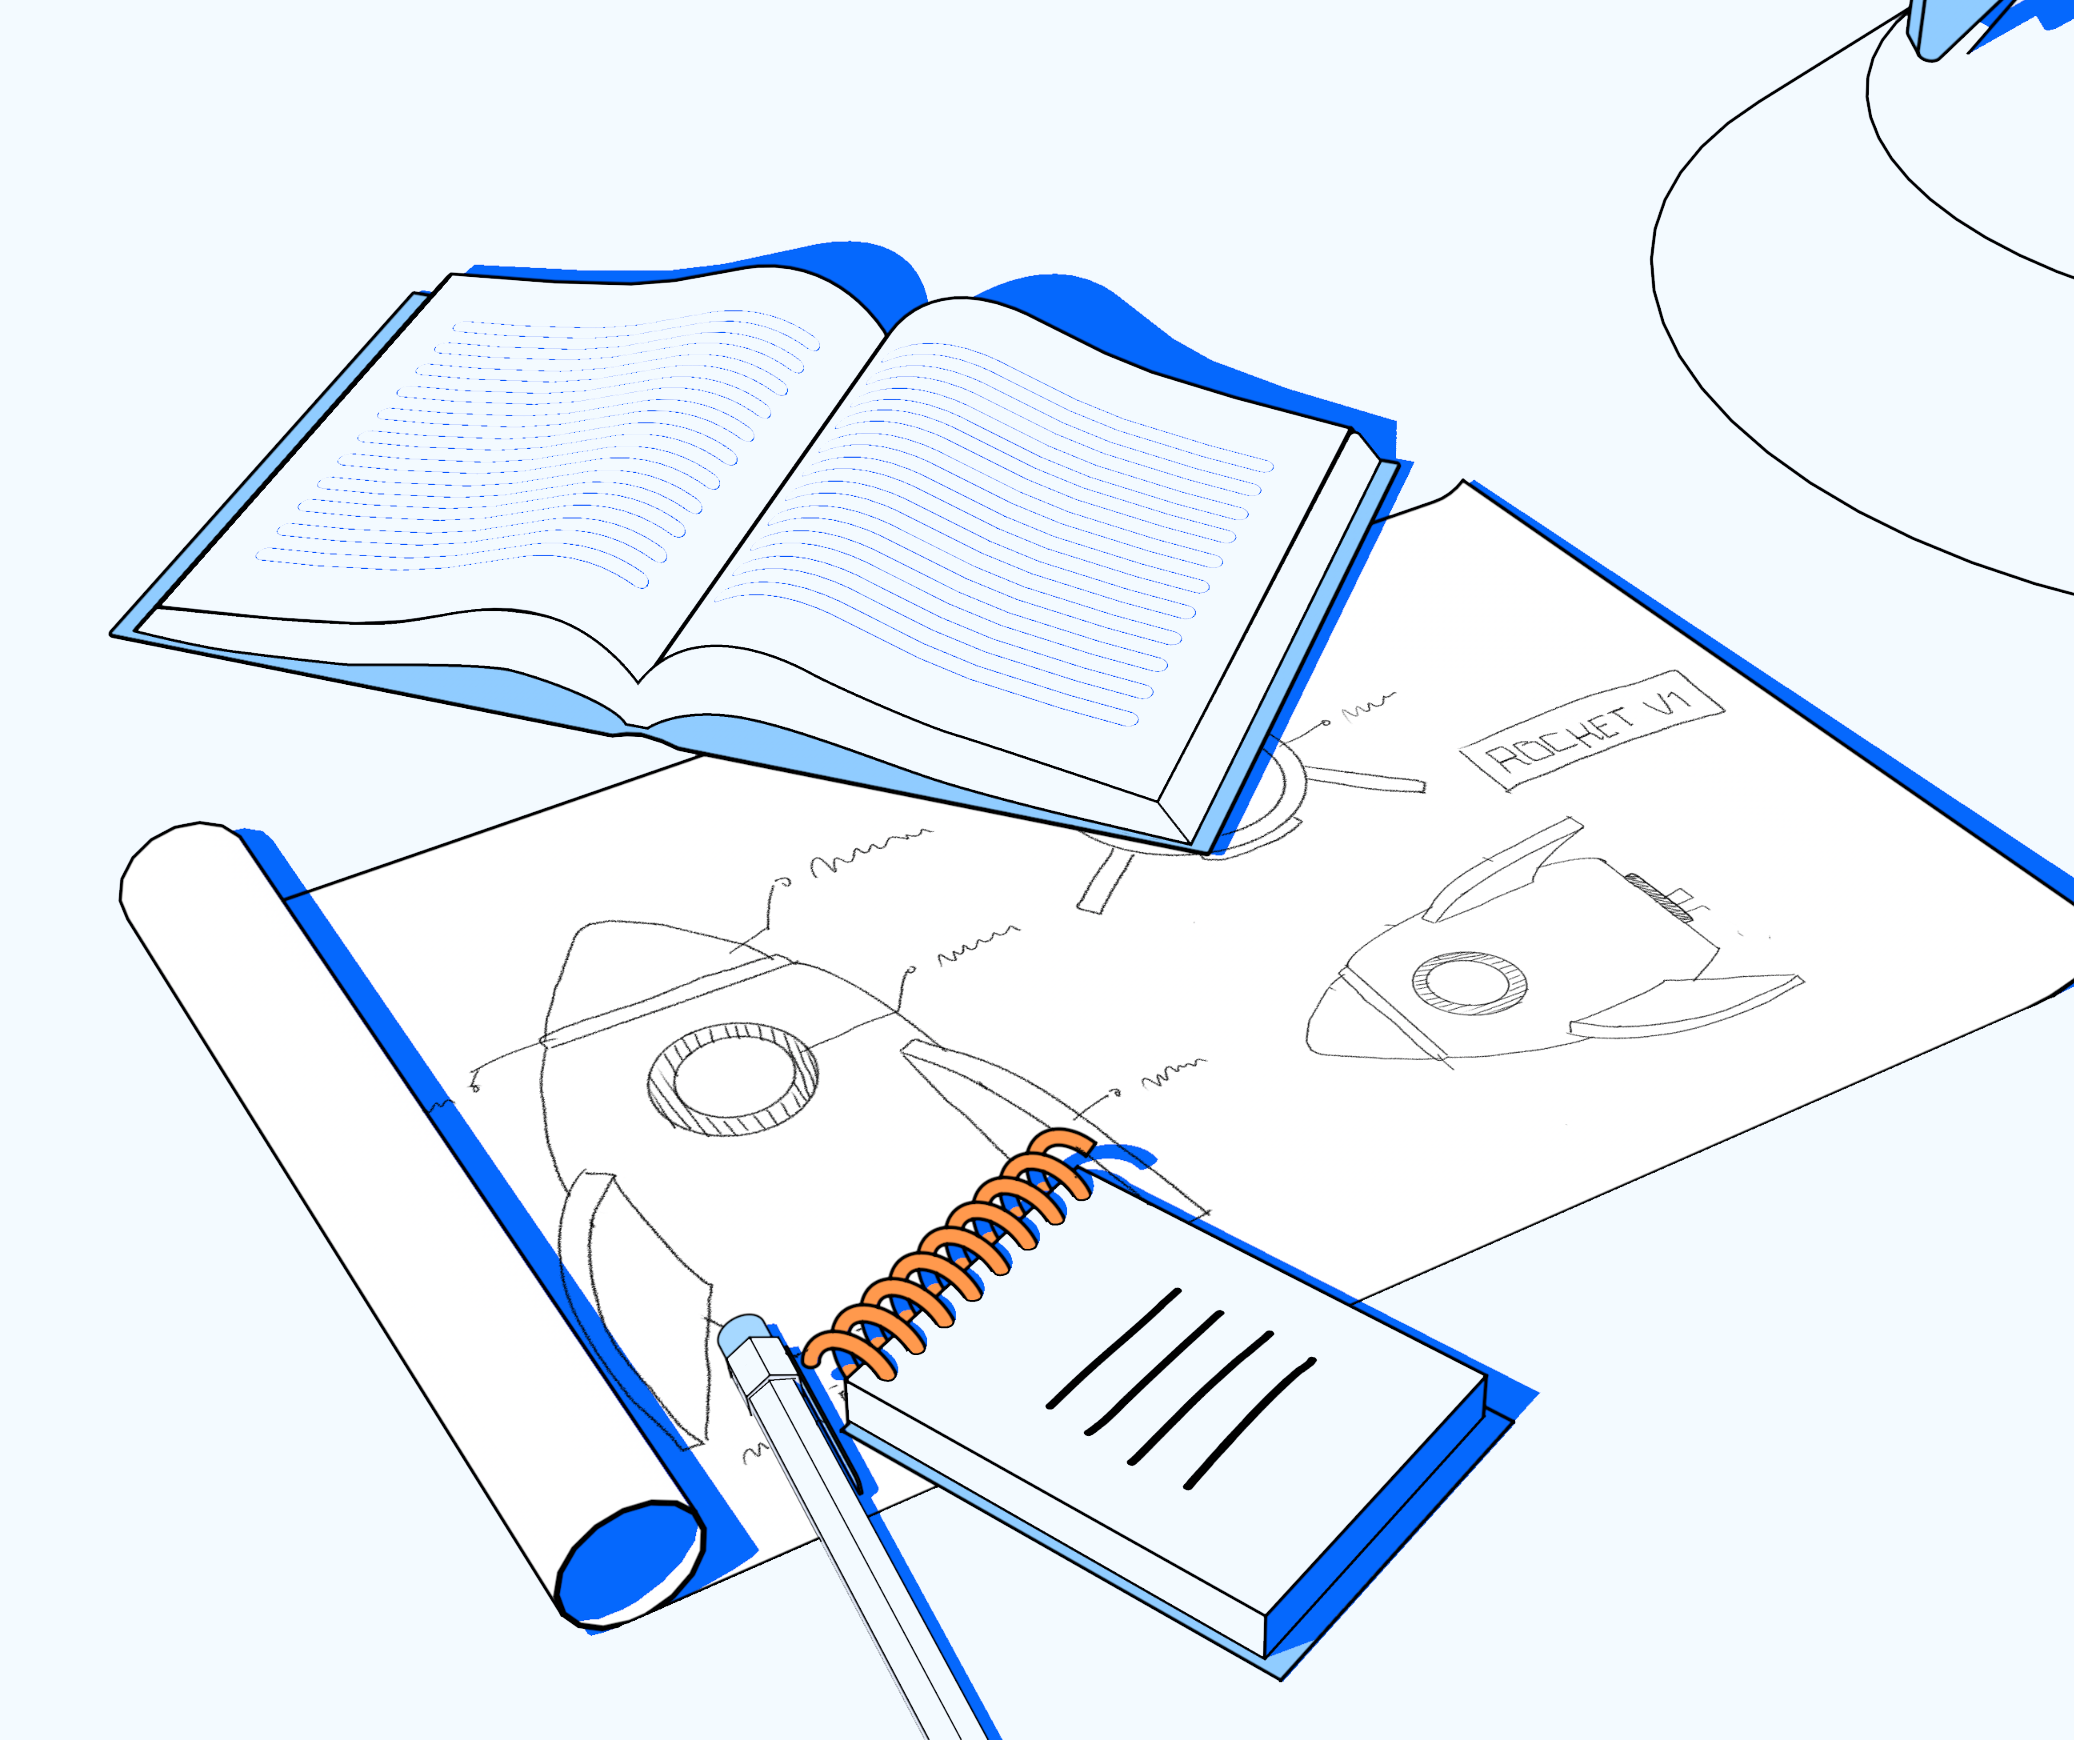 maze-product-development-process-thumbnail